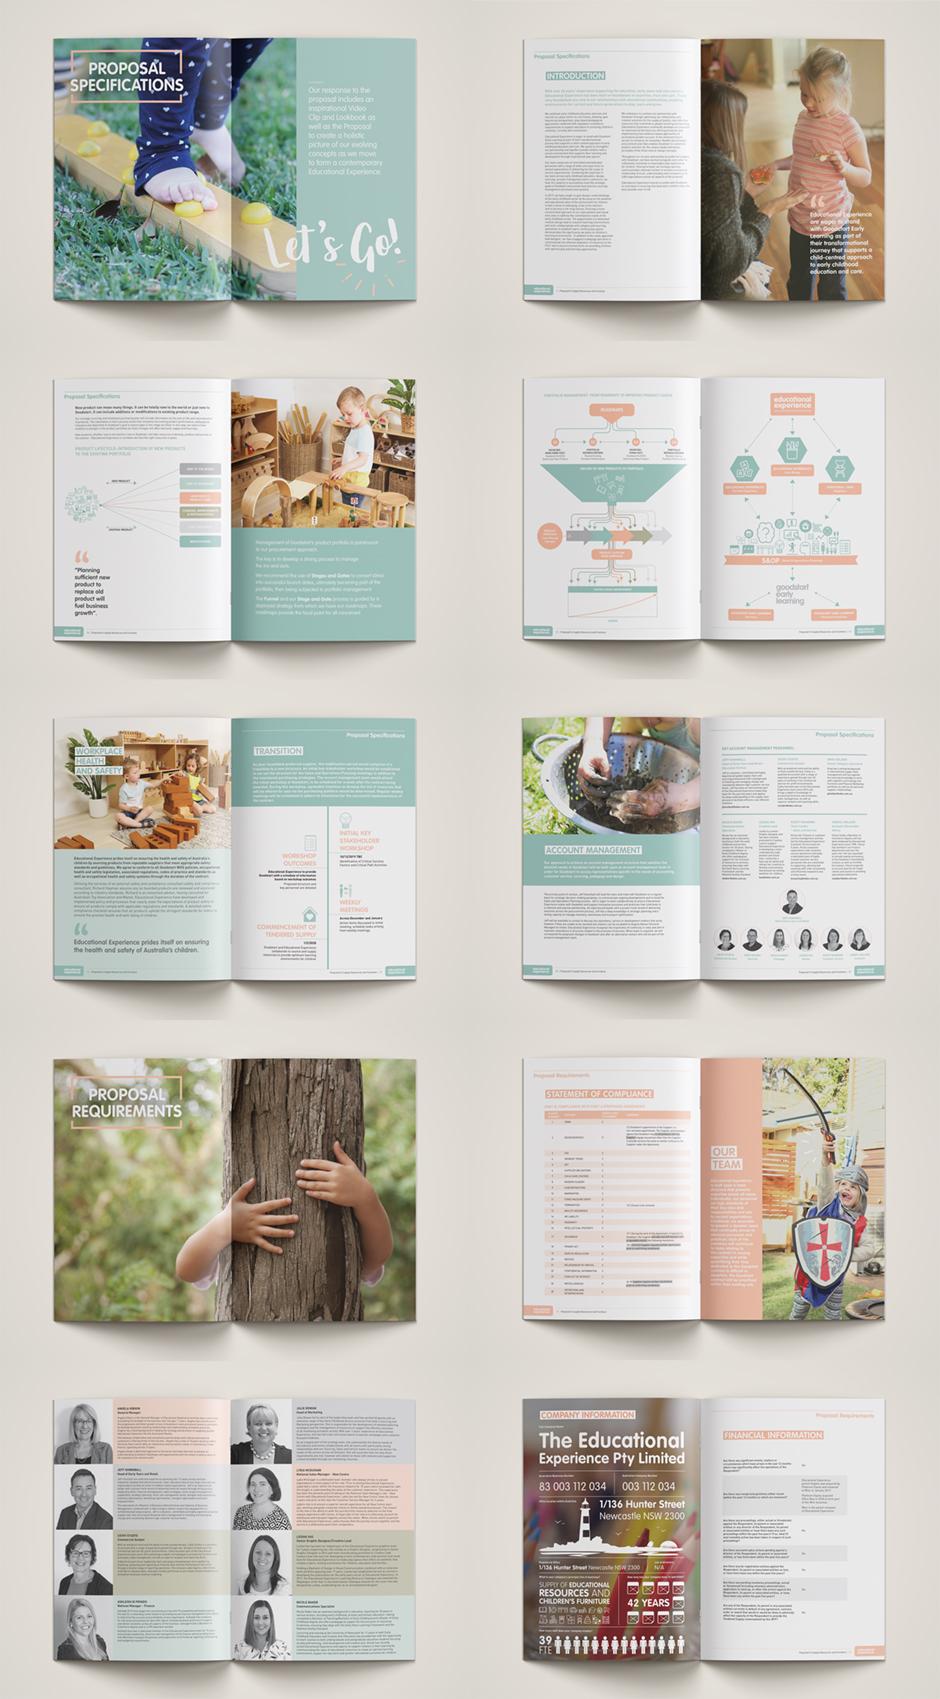 Tender Document Graphic Design